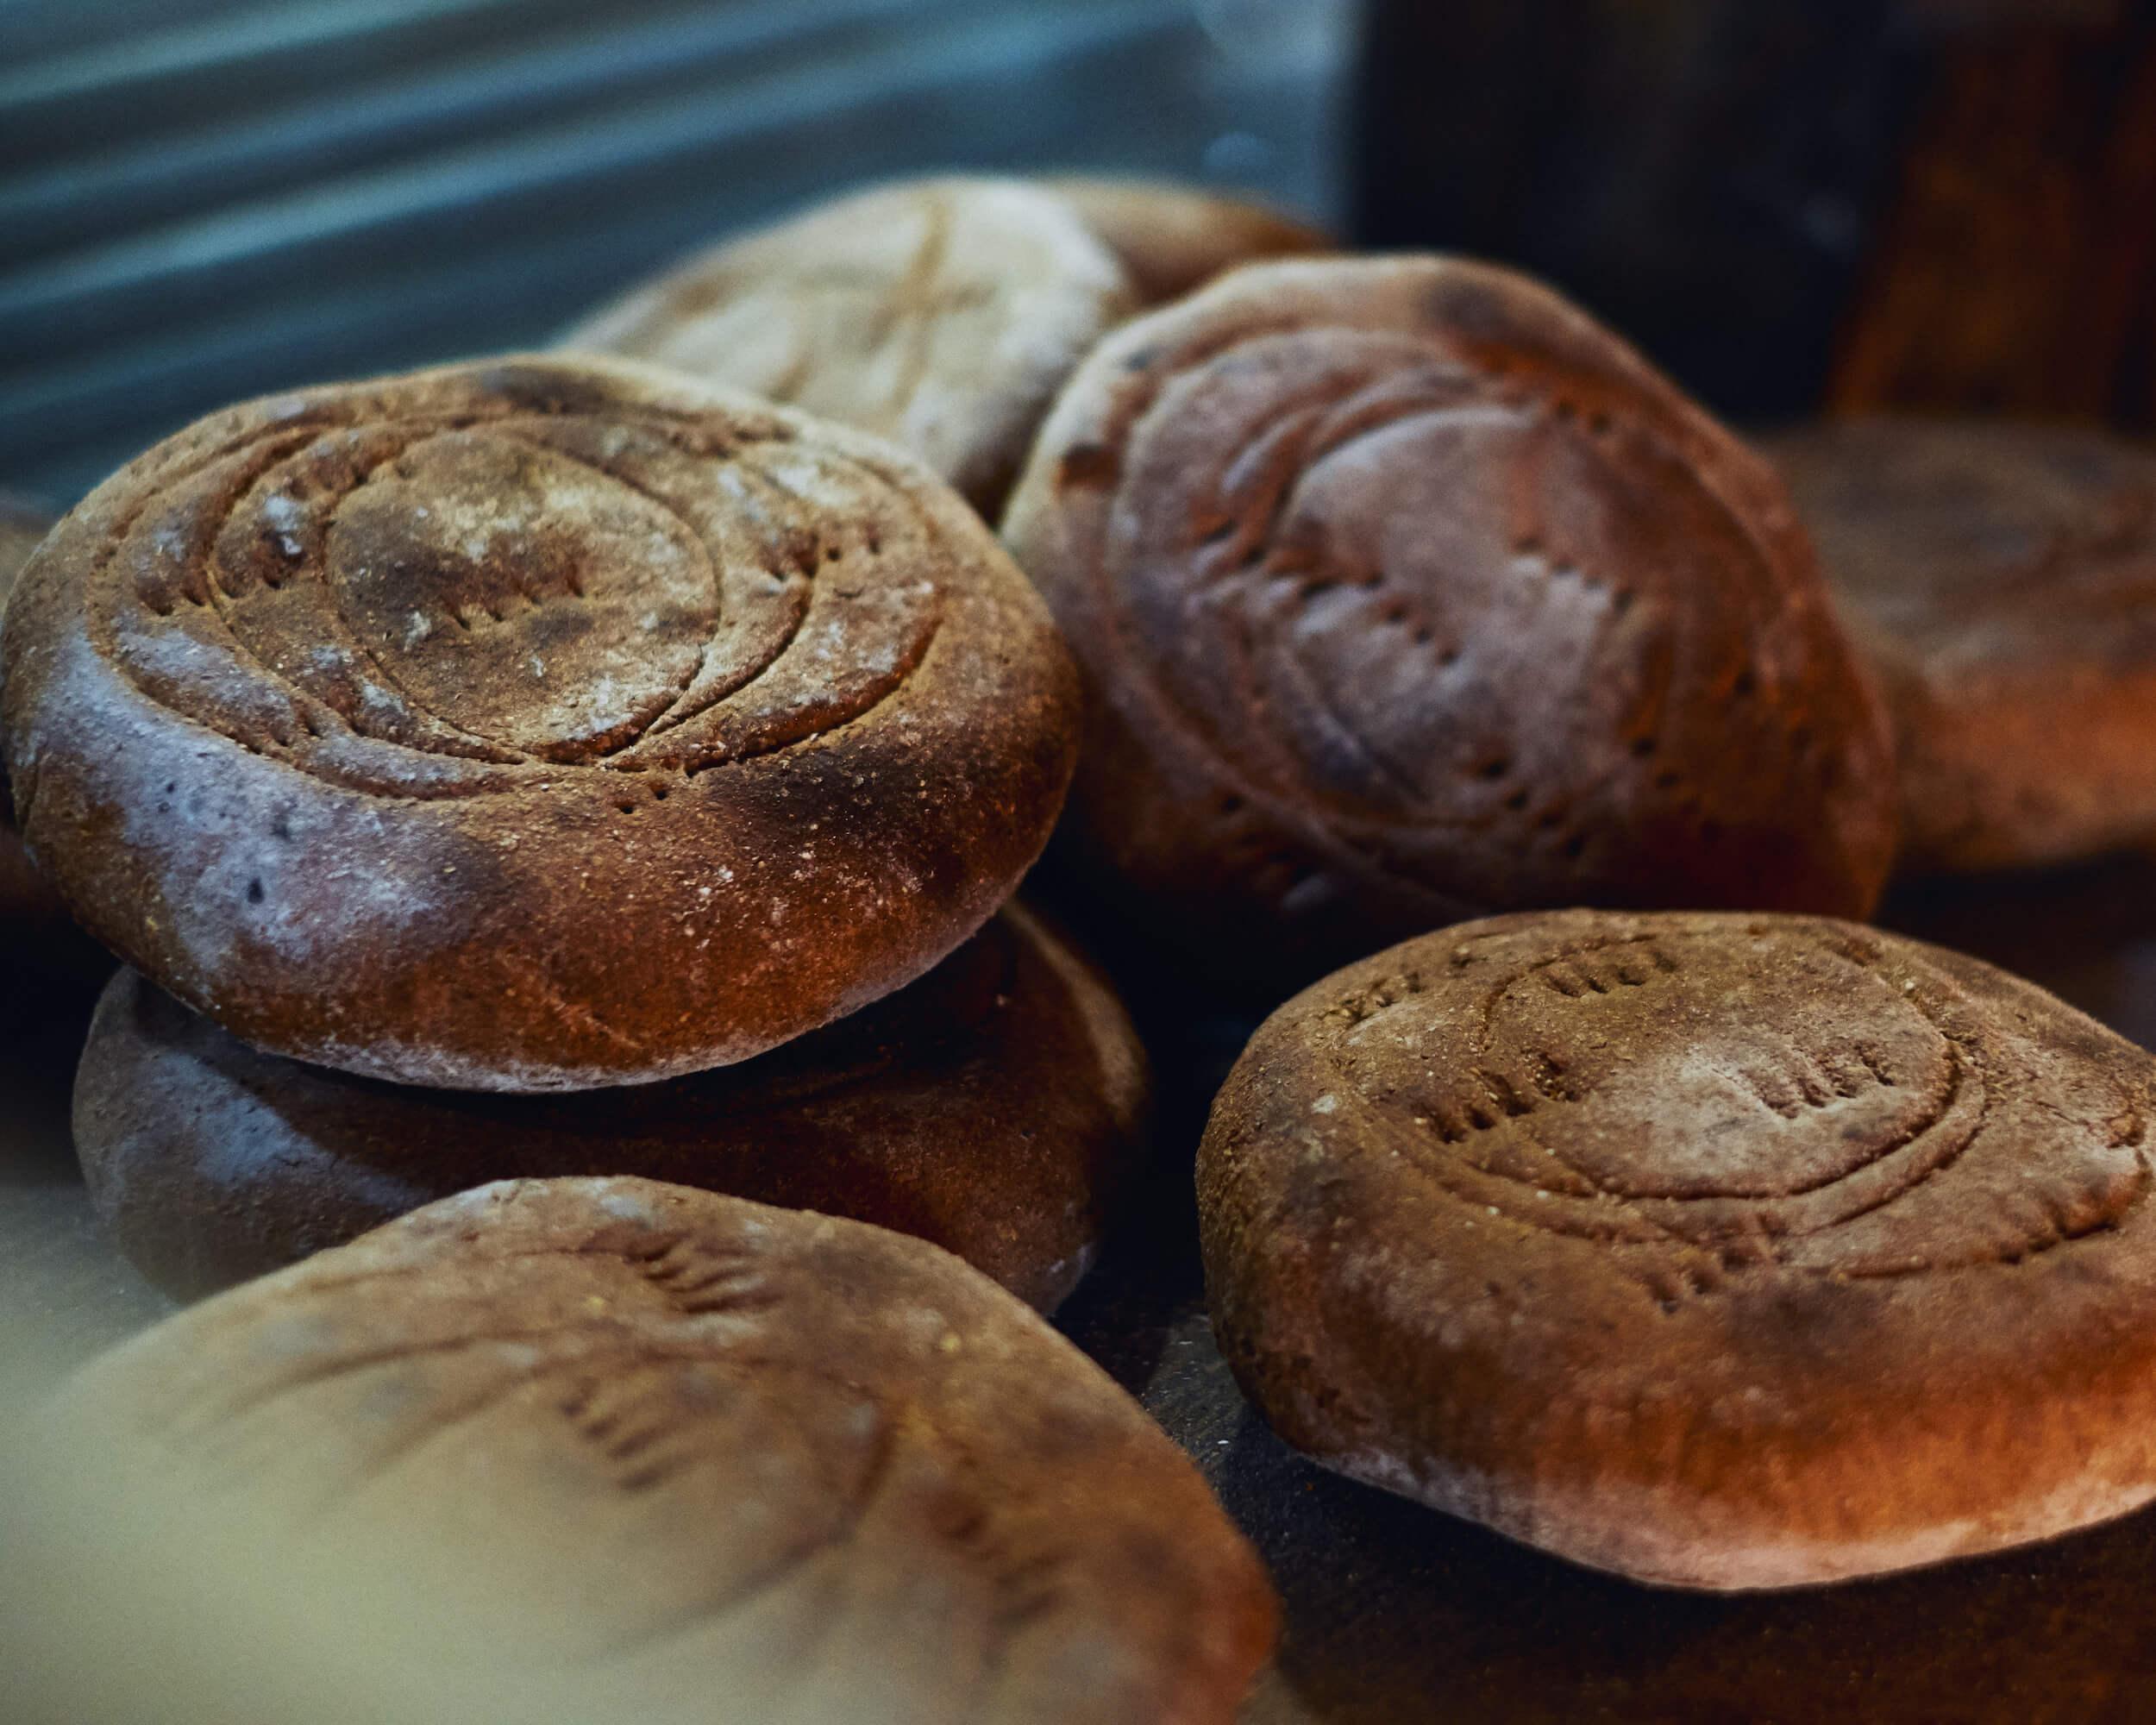 Mullixhiu Bakery Bread